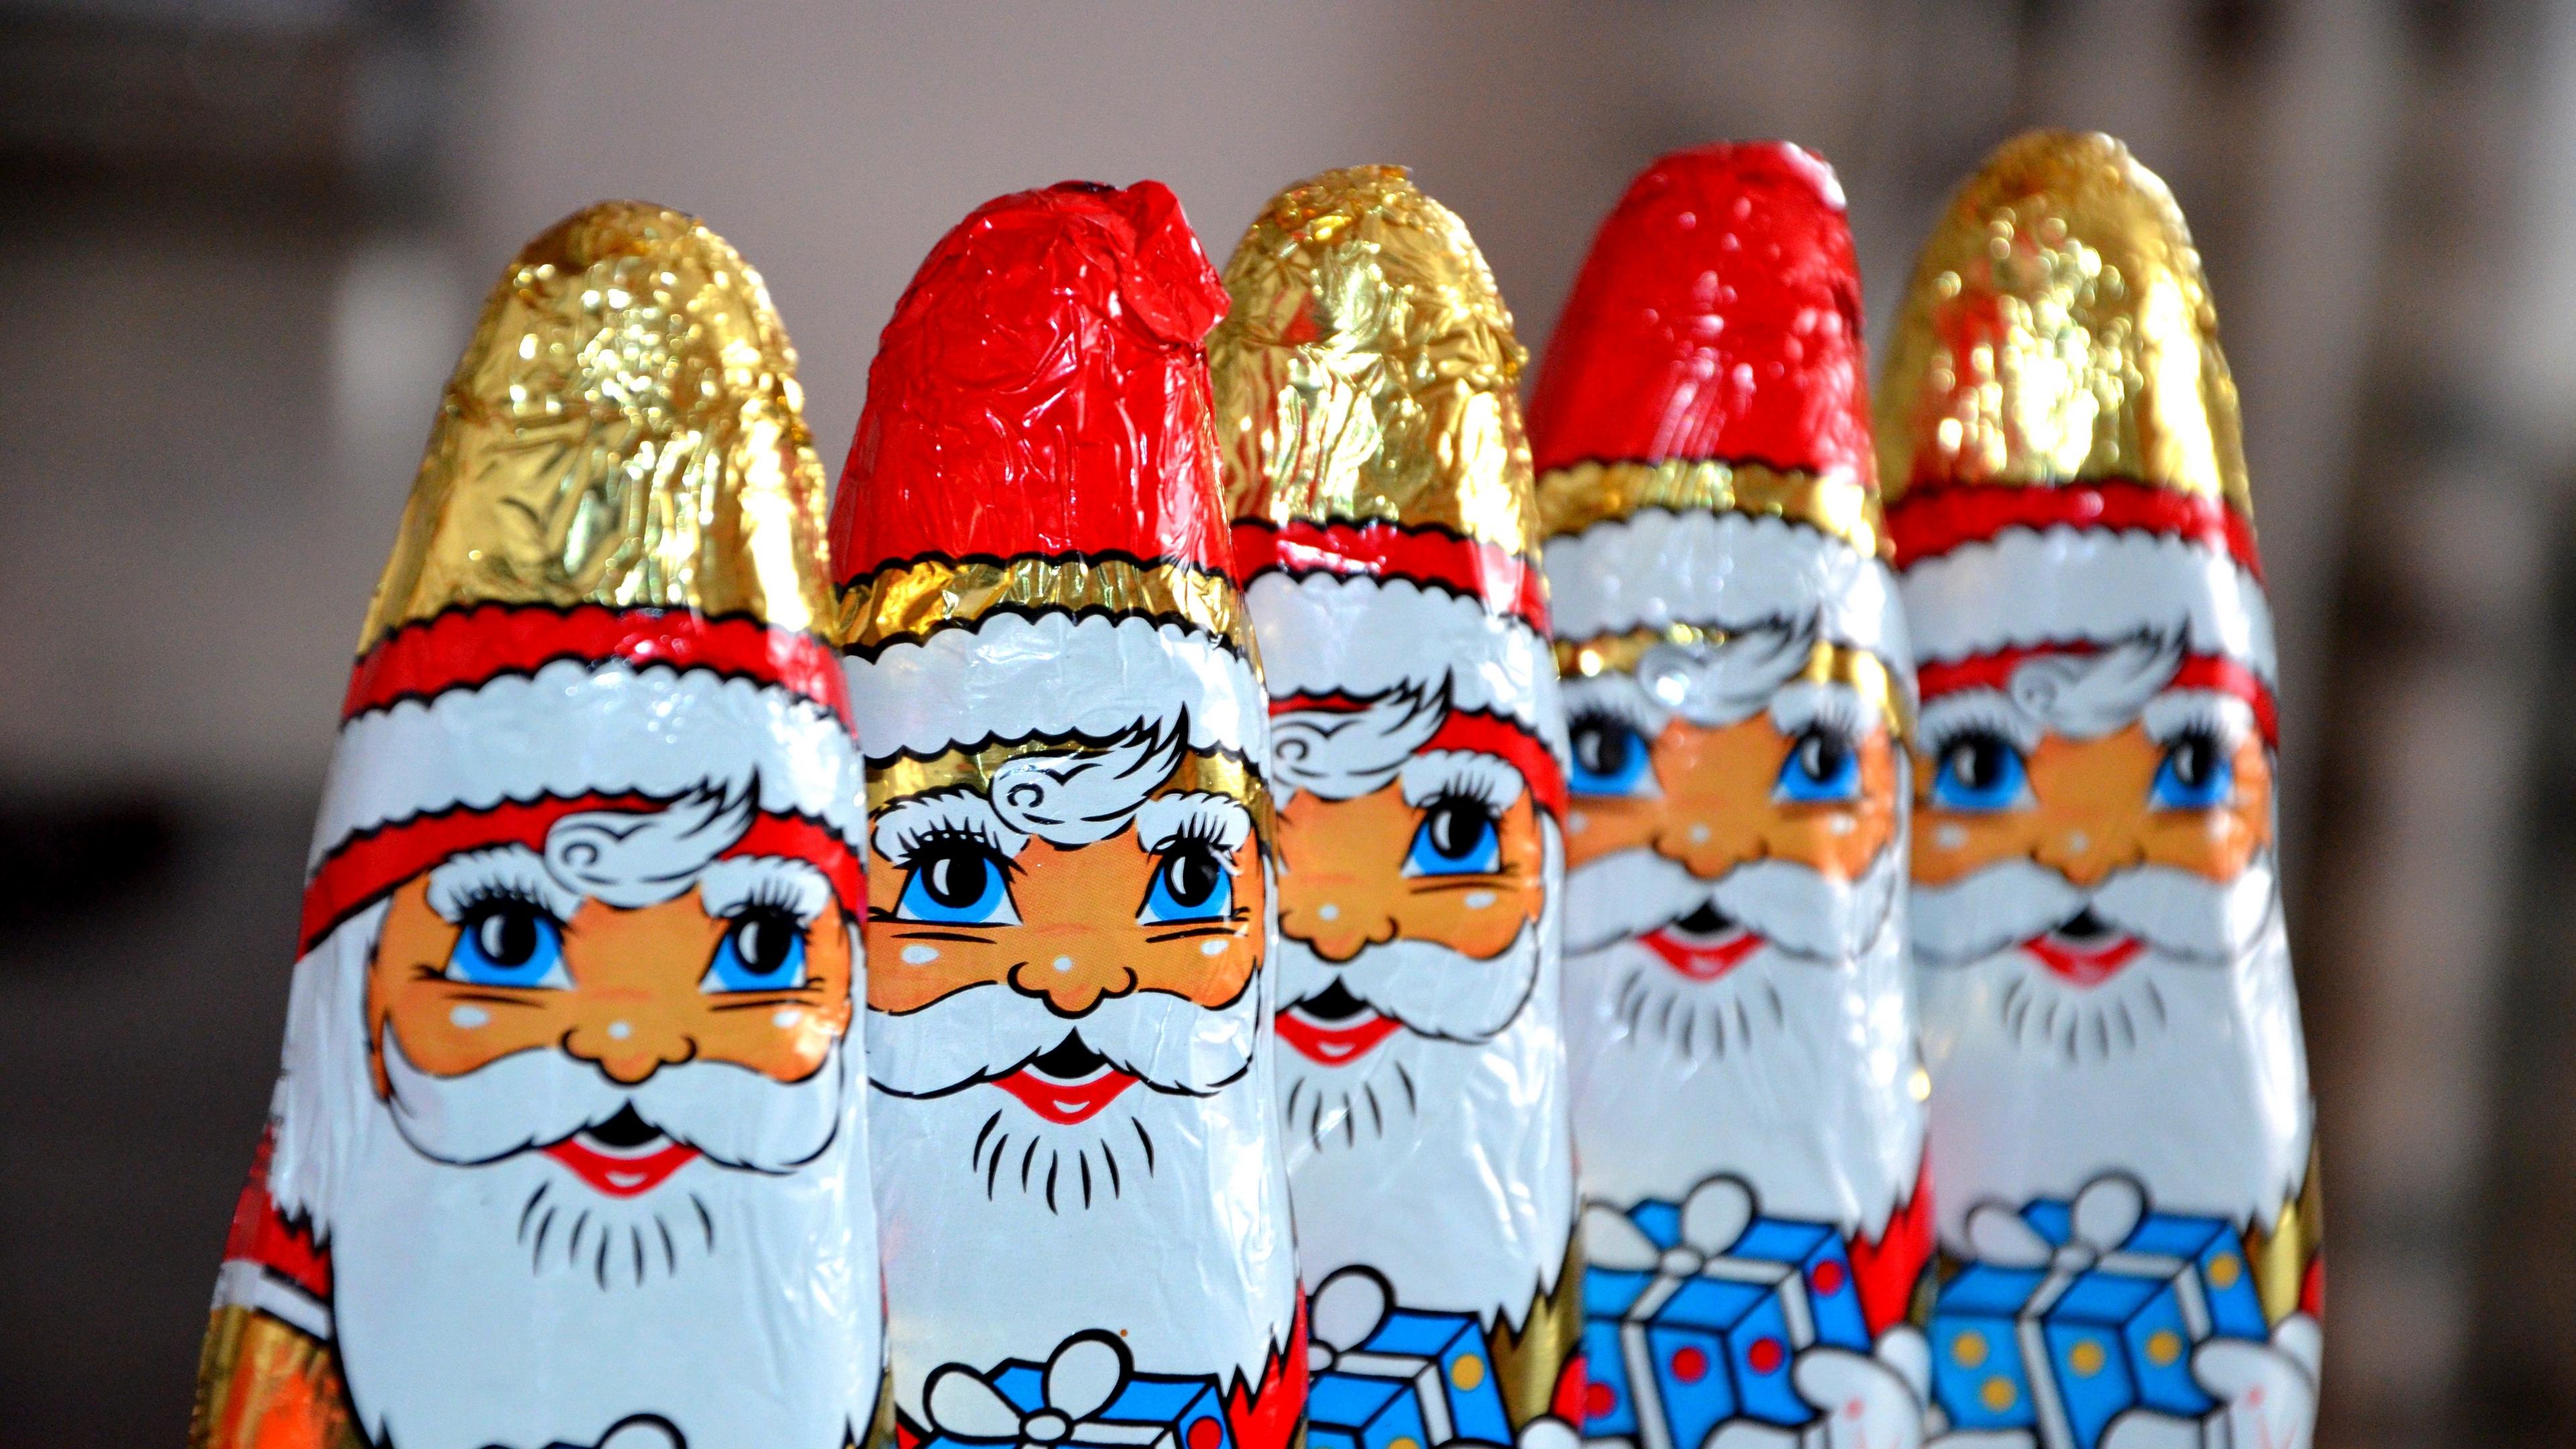 santa claus chocolates candy 4k 1538344919 - santa claus, chocolates, candy 4k - santa claus, chocolates, Candy